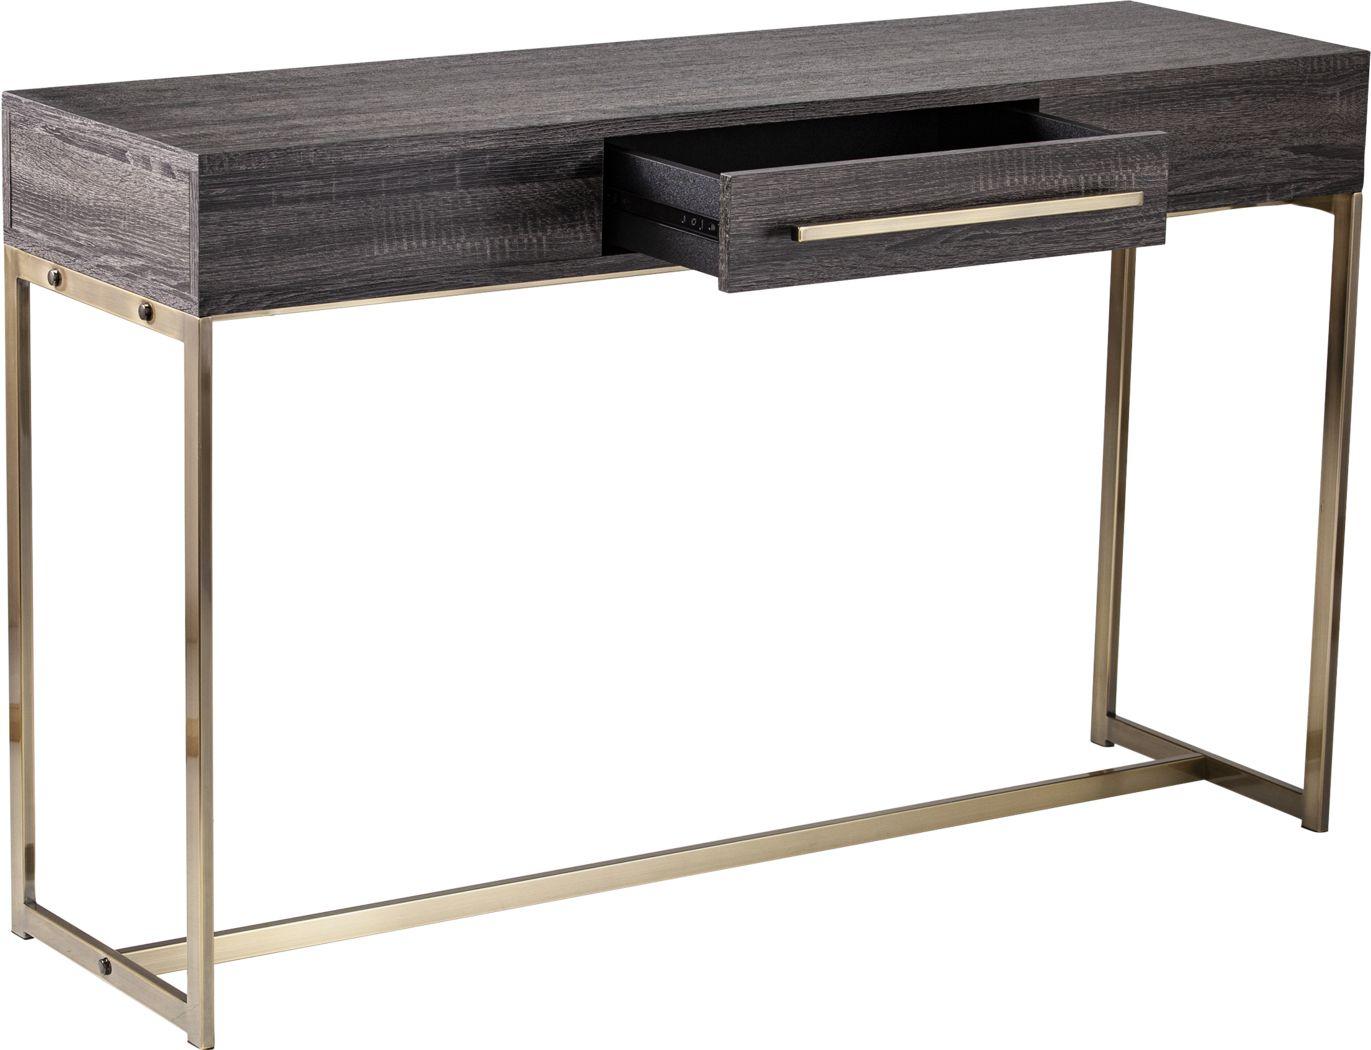 Hilwill Black Sofa Table